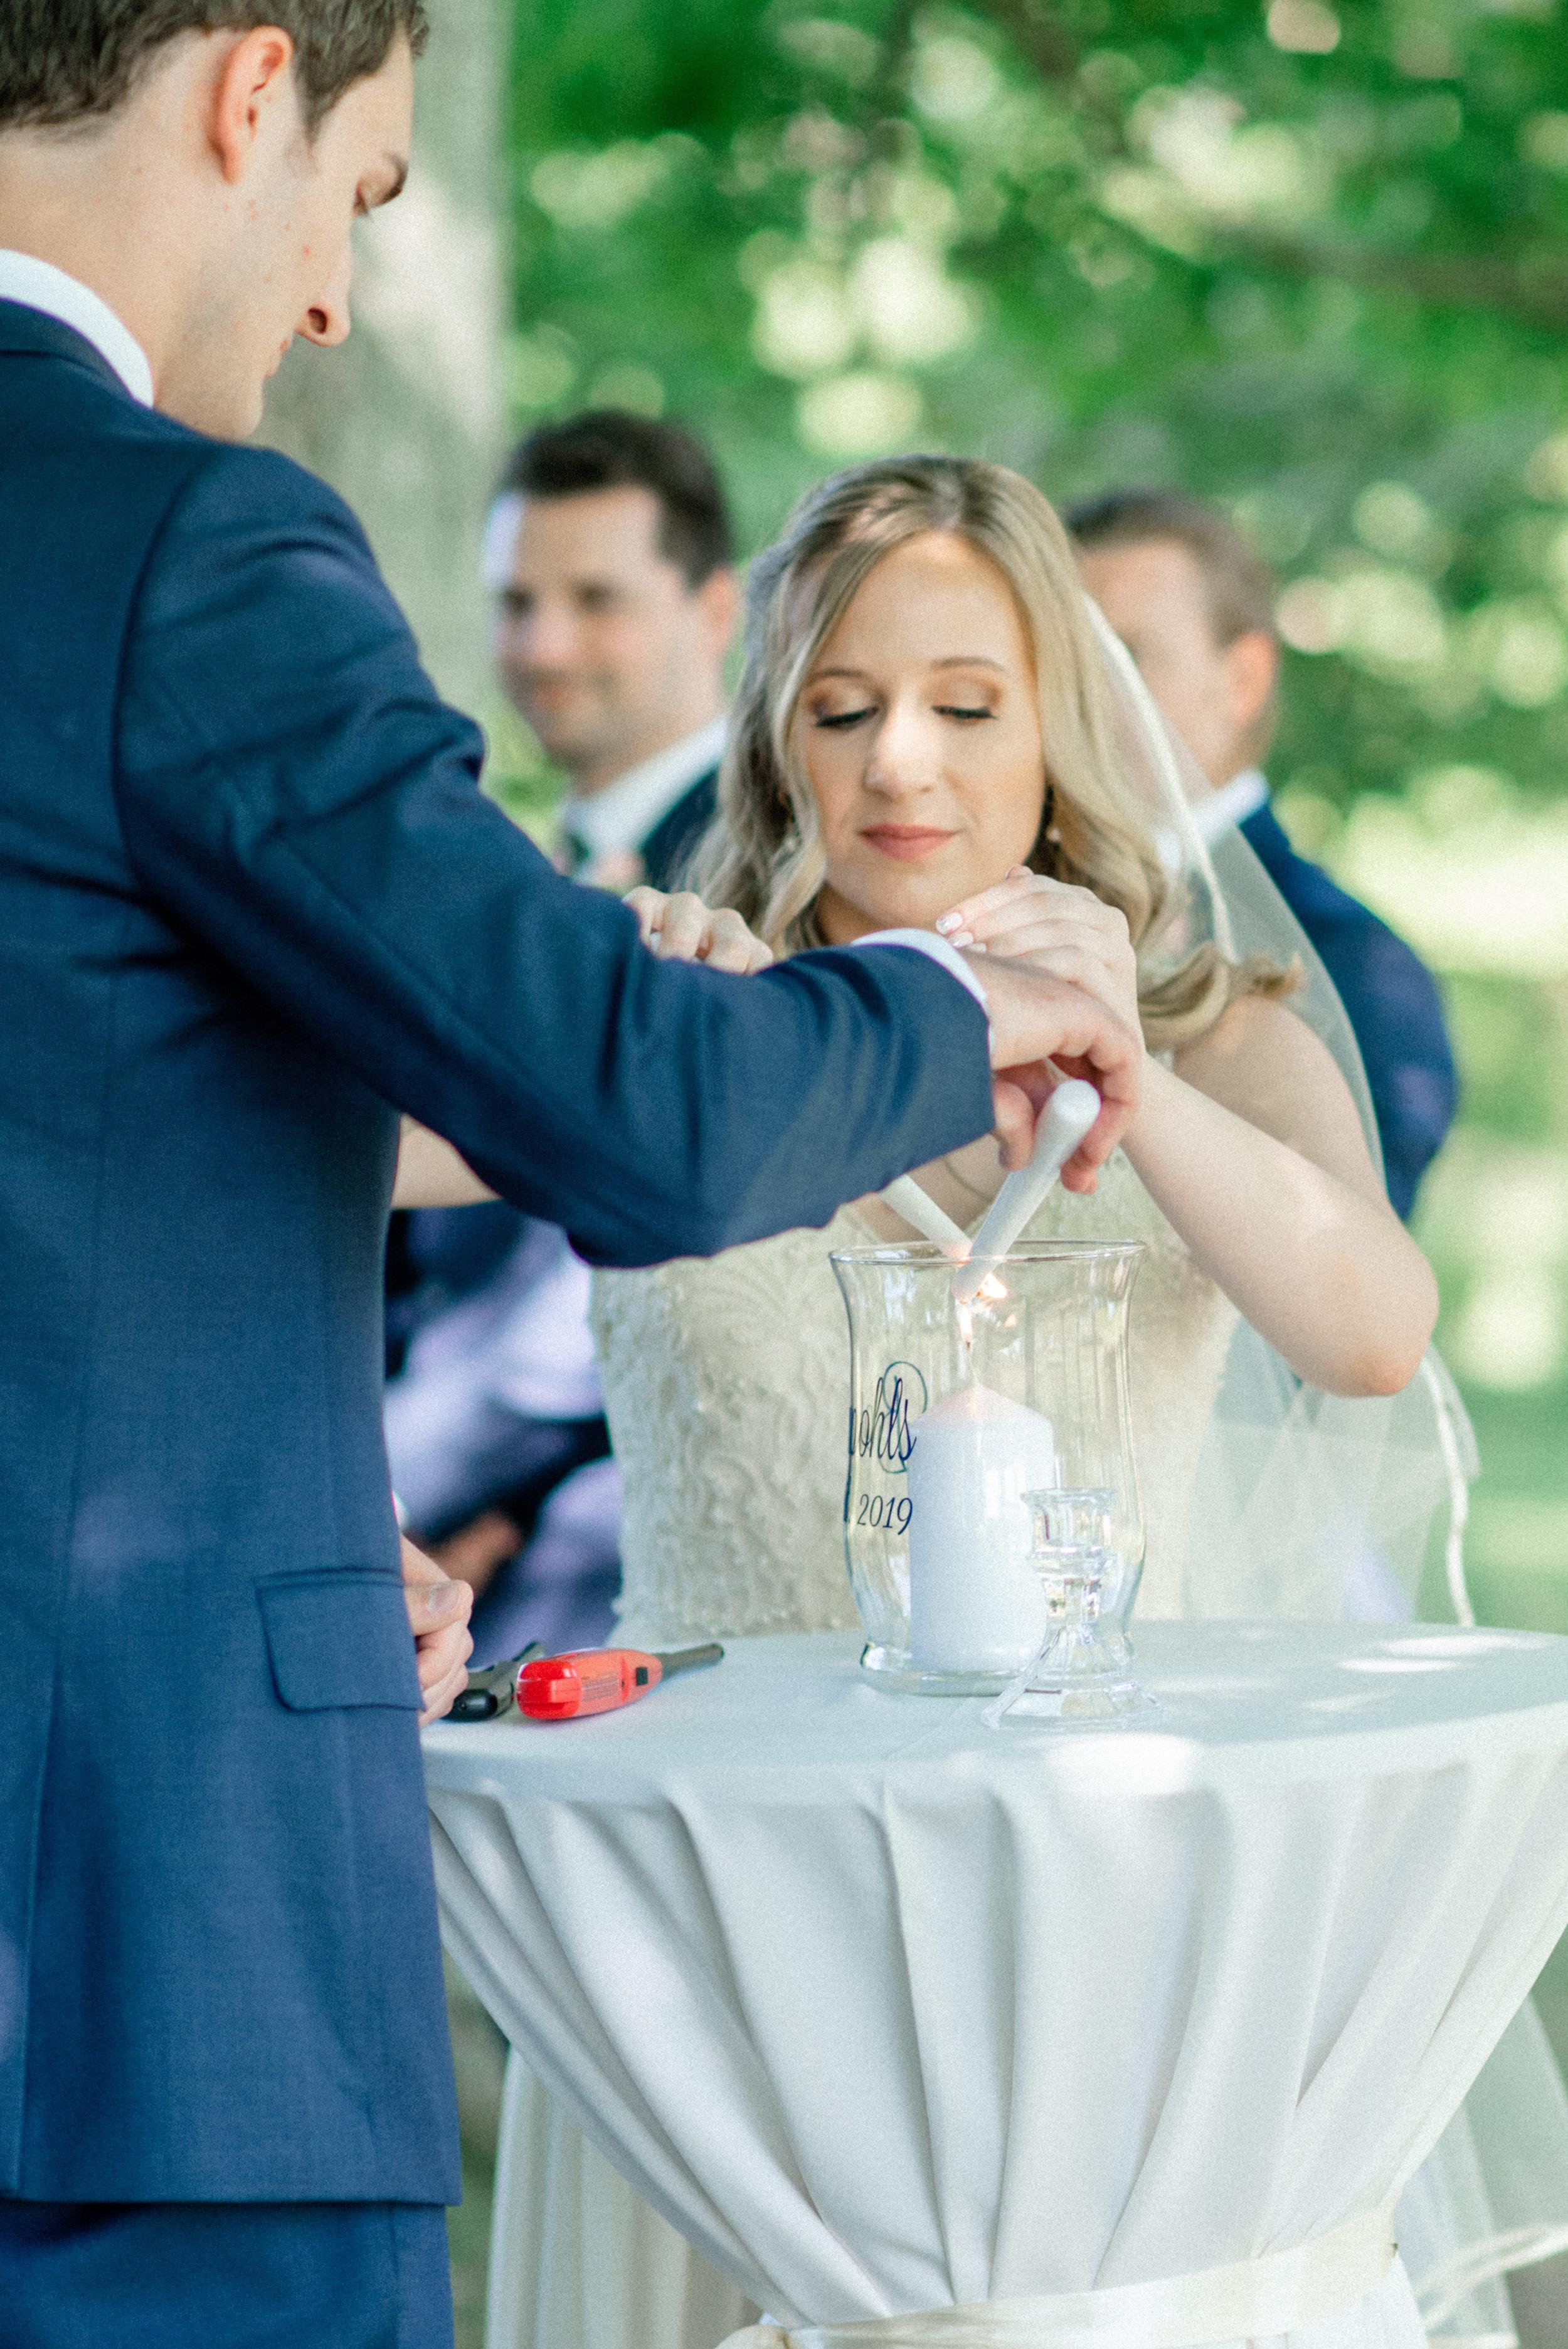 Ceremony-Anna+Dan_(85_of_115).jpg